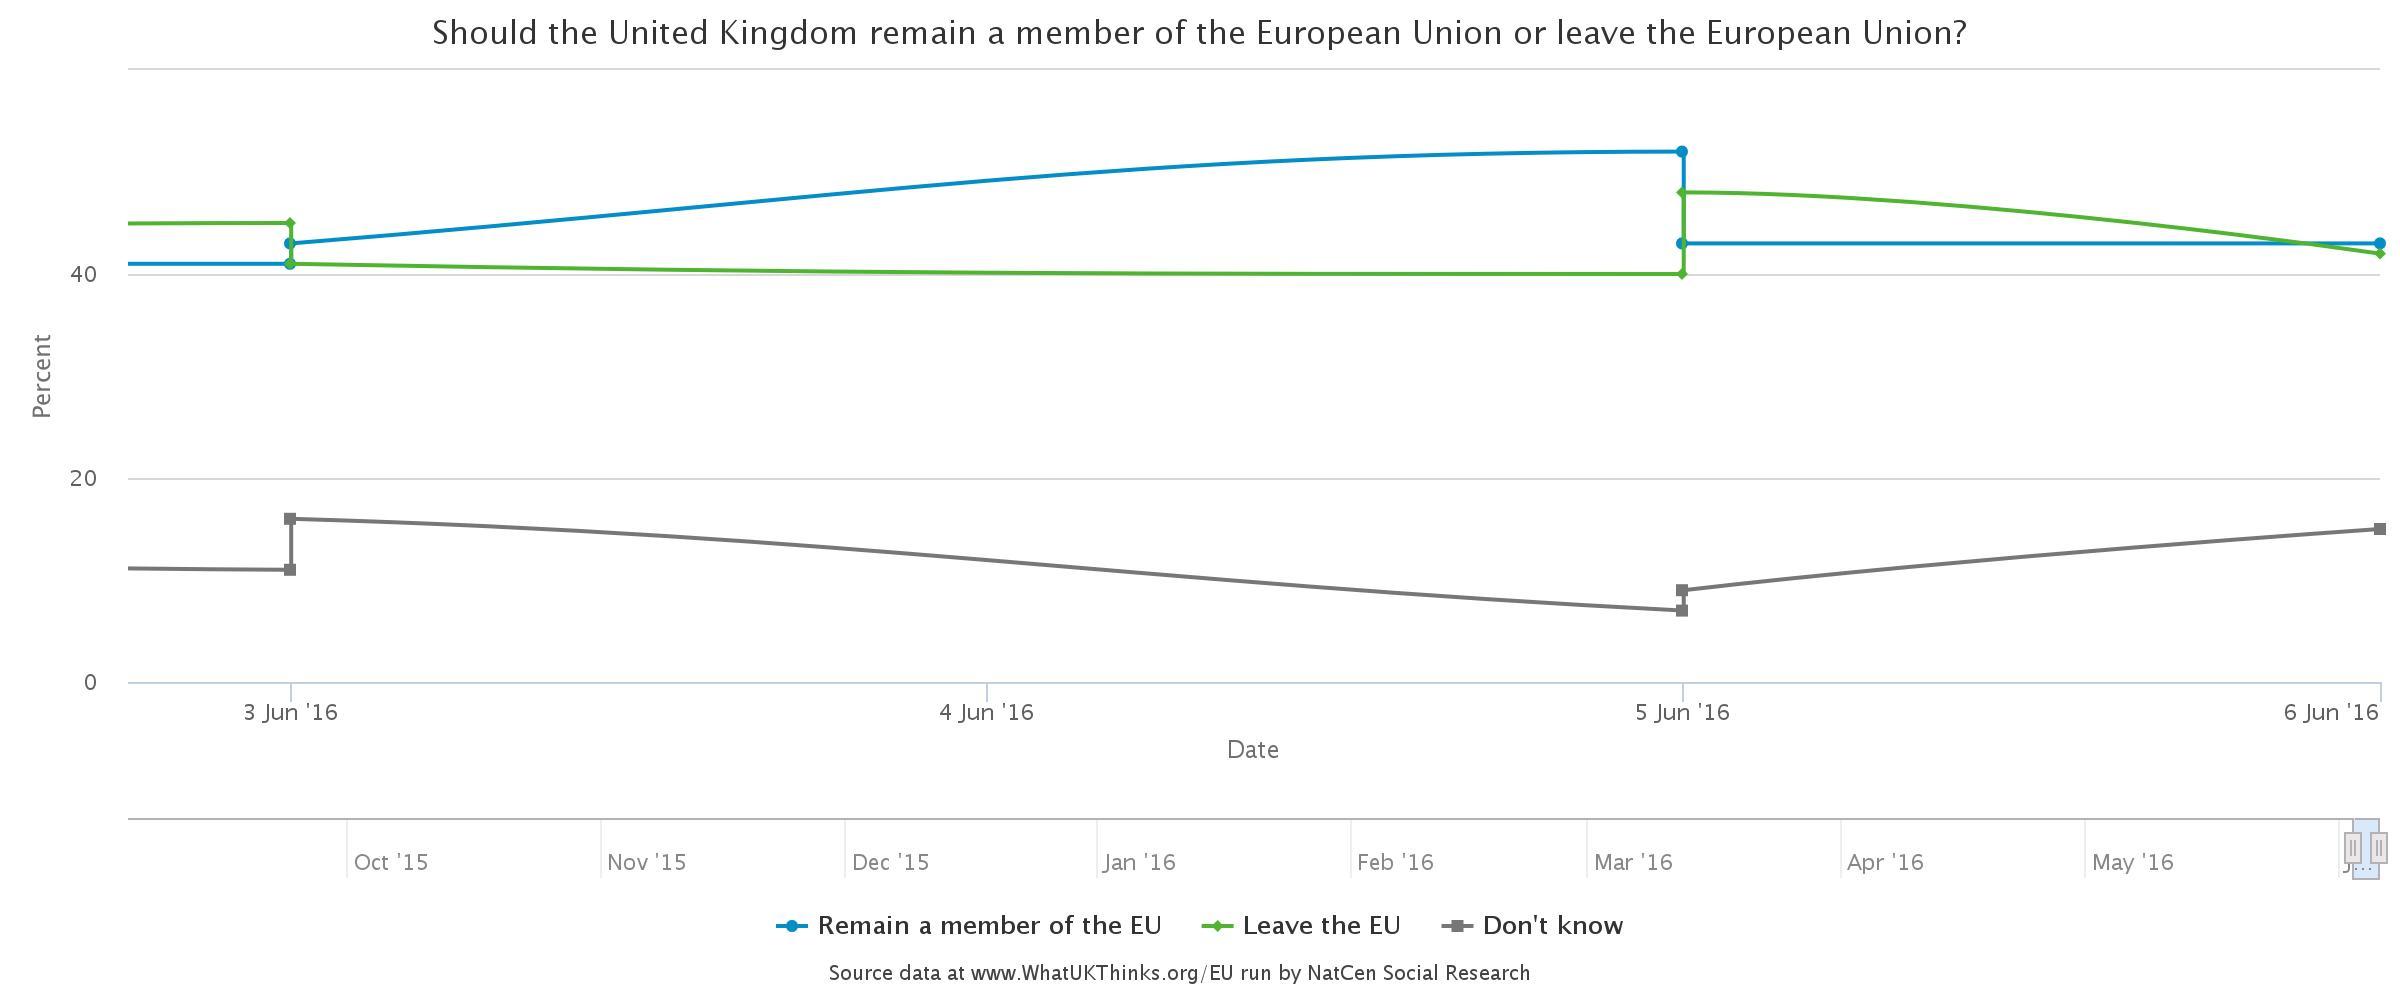 brexit spanish property market implications